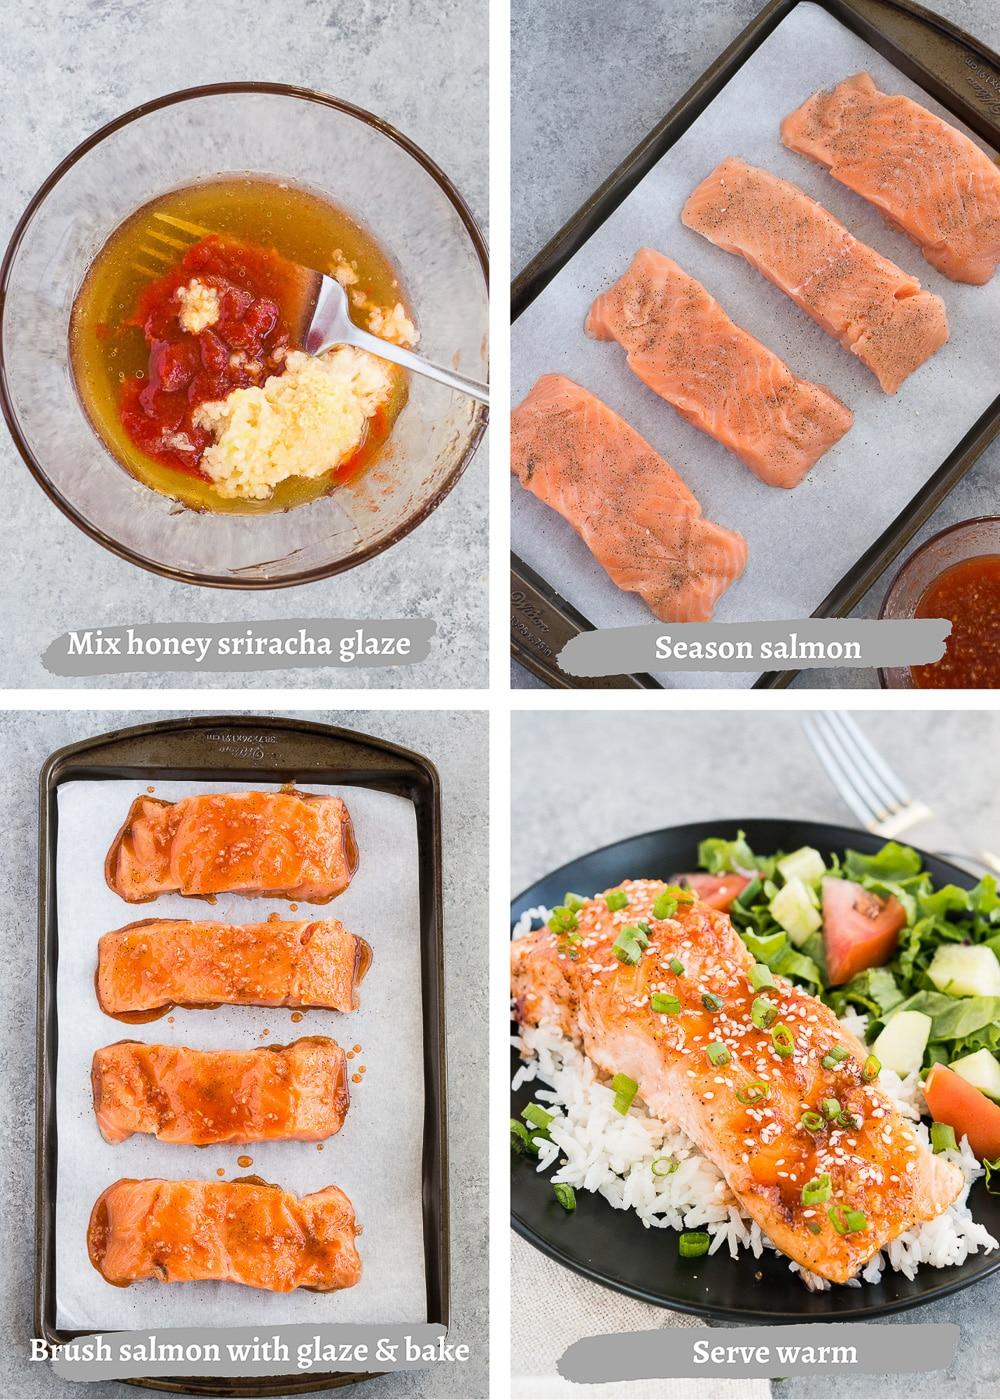 process shots of making honey glazed salmon